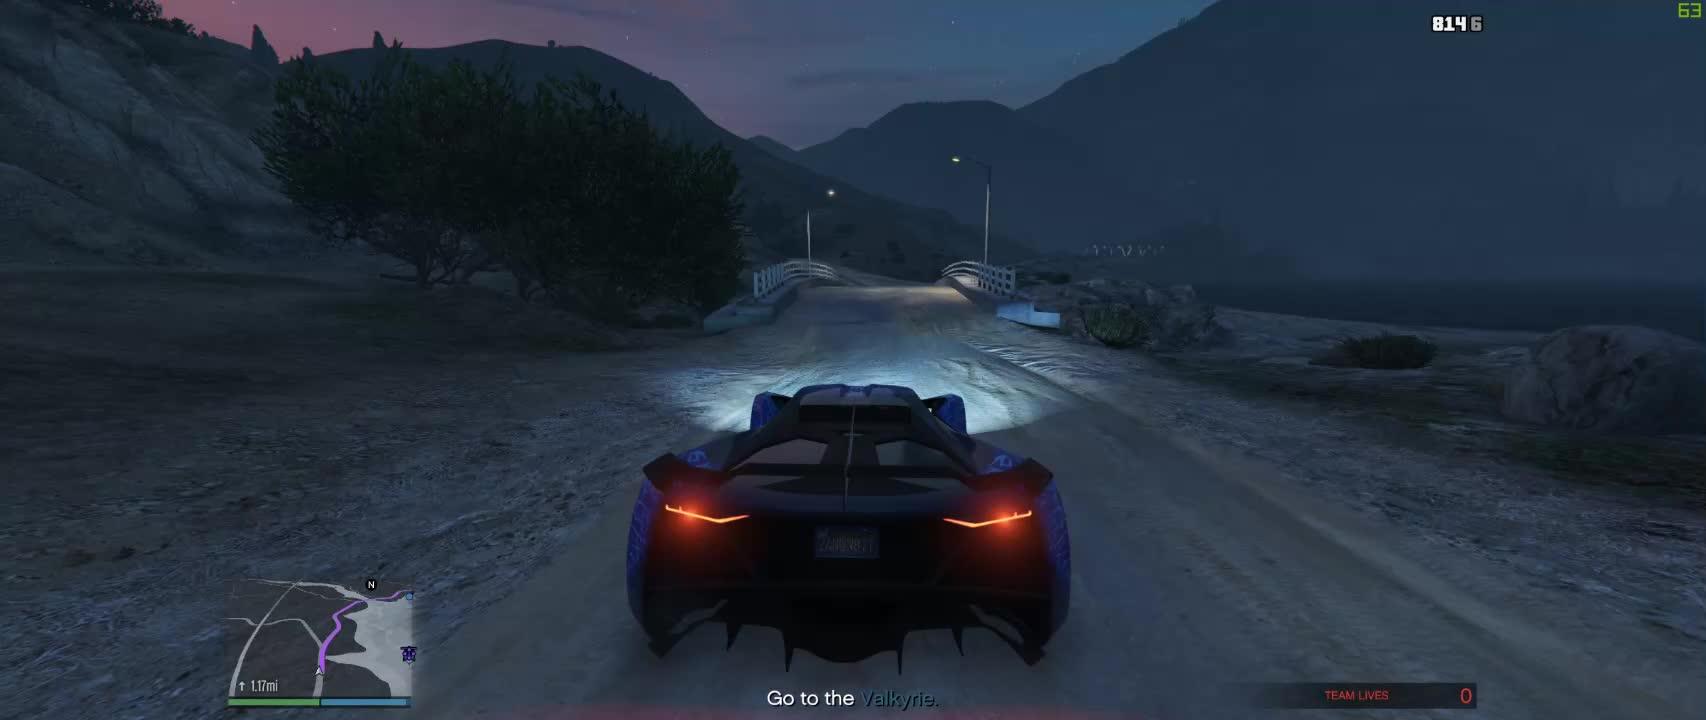 grandtheftautov, Grand Theft Auto V 2018.05.24 - 18.38.11.04.DVR.mp4-00.00.44.391-00.00.53.396 GIFs